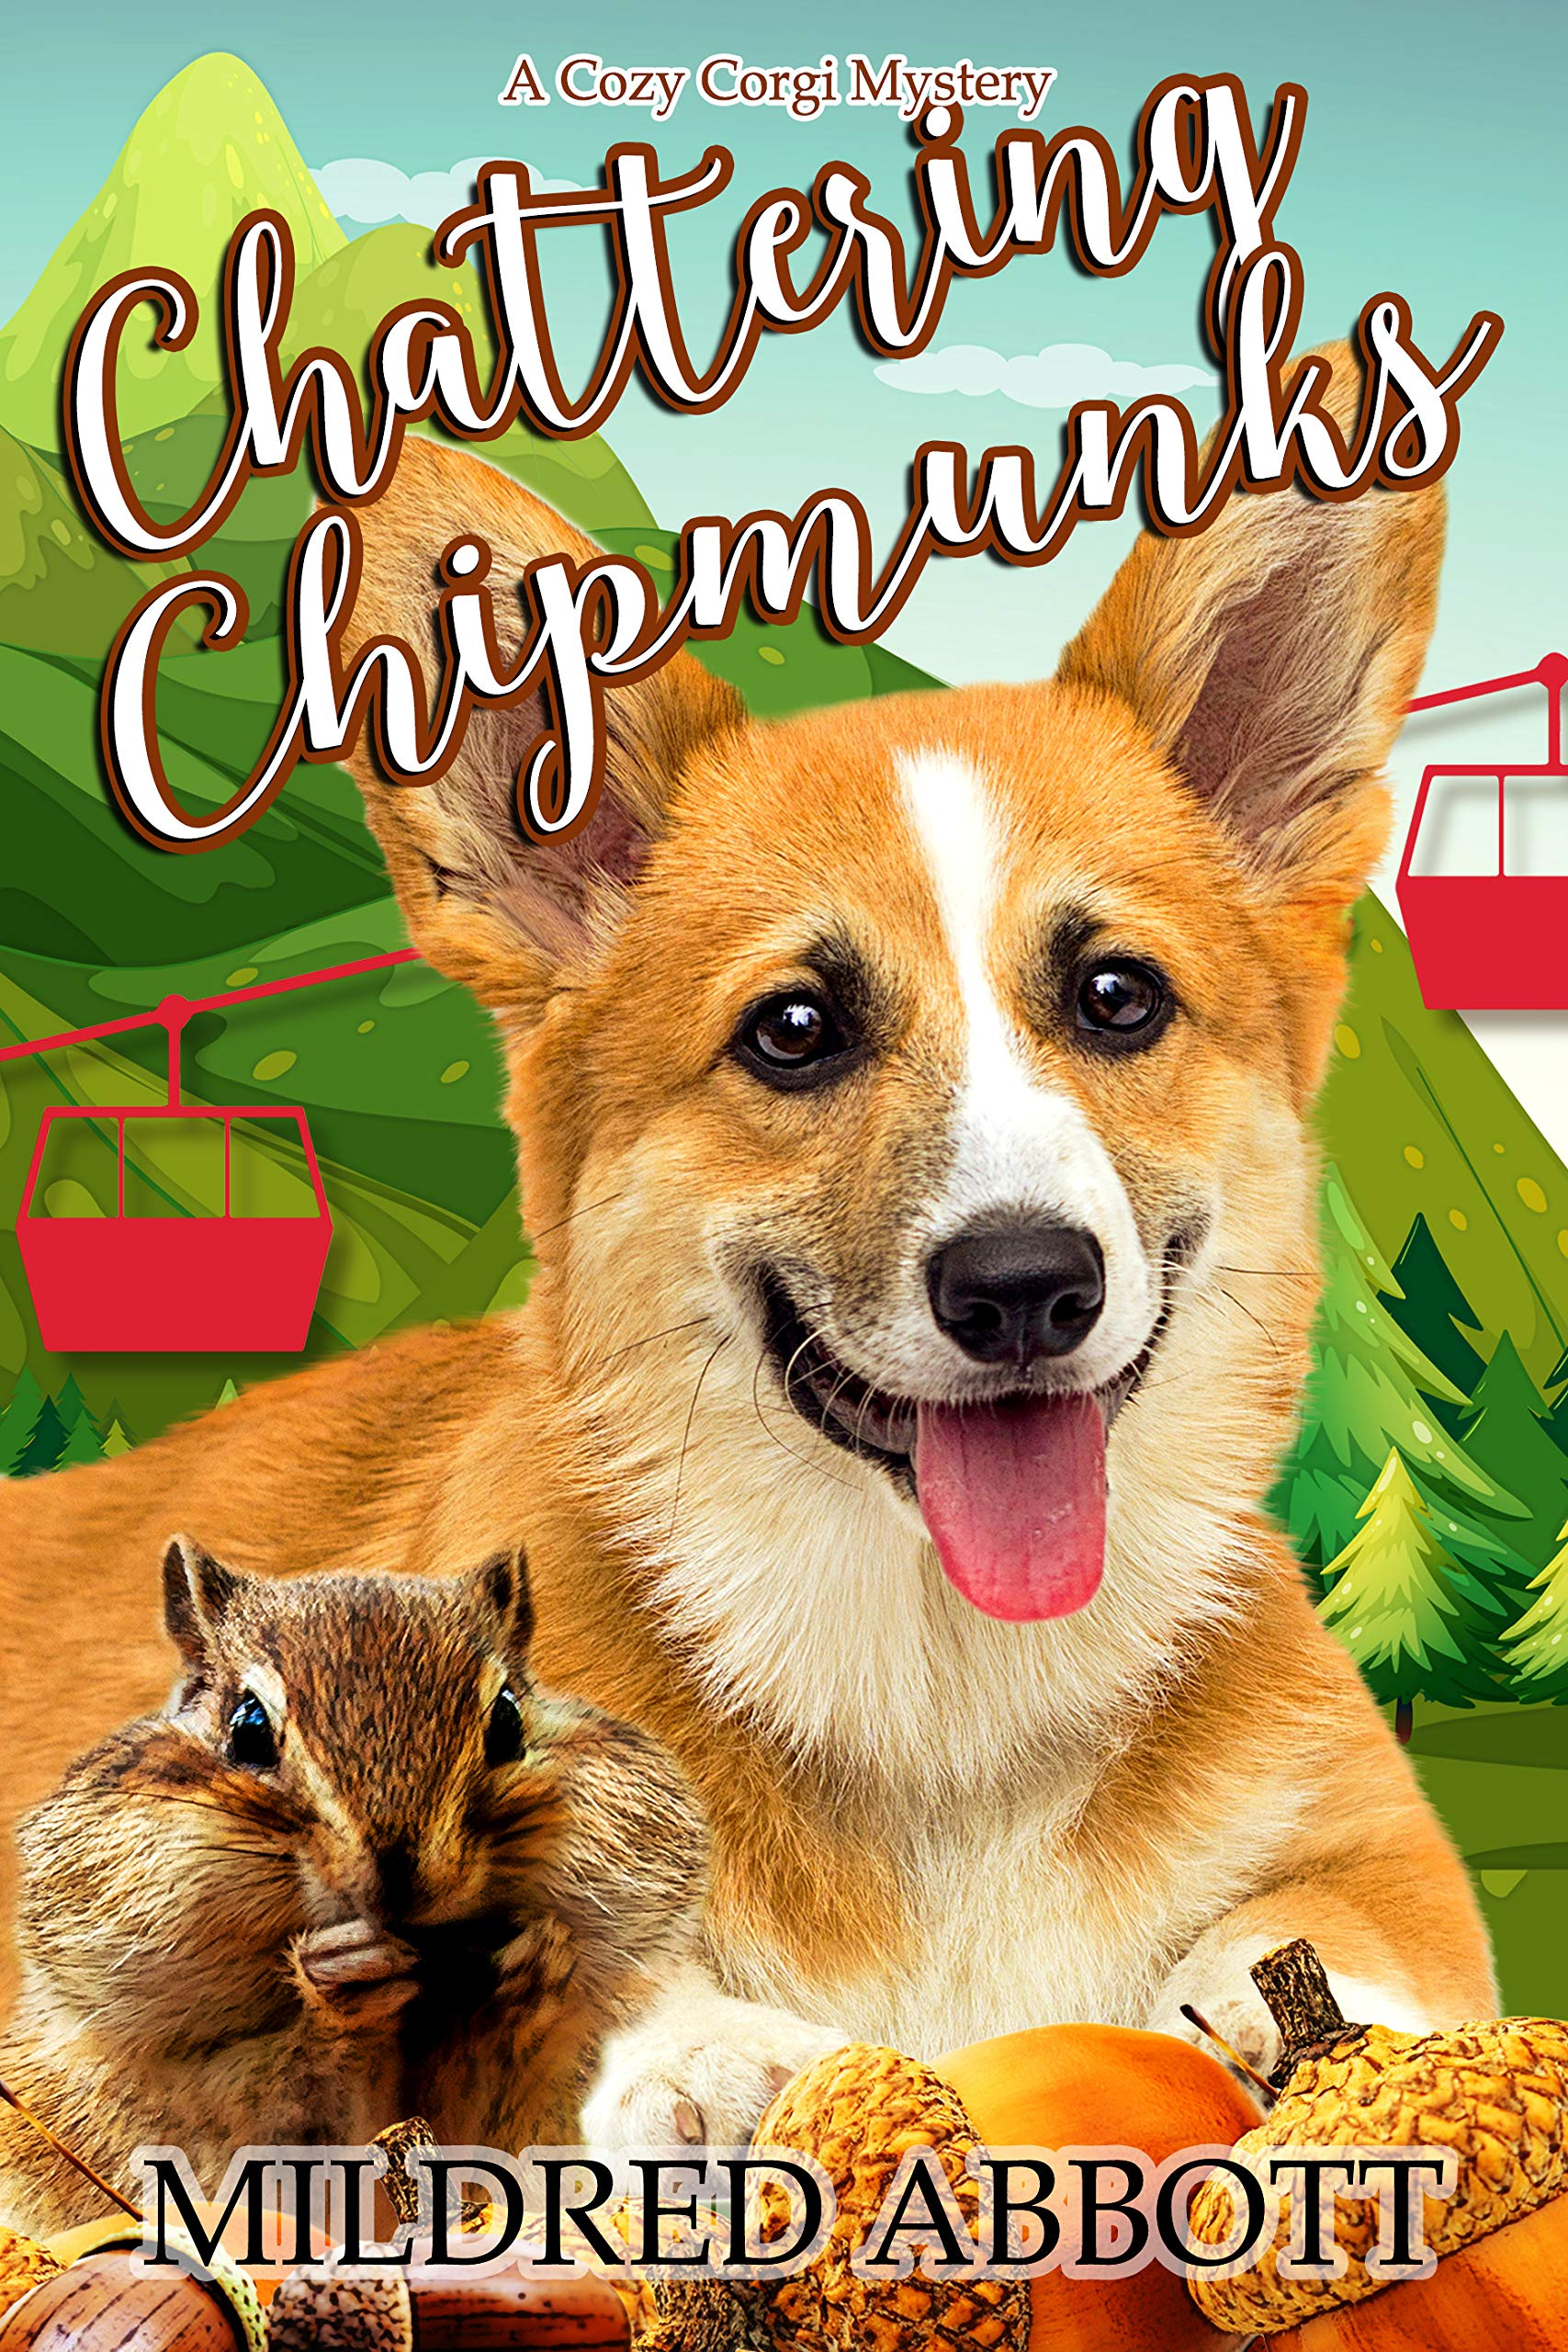 Chattering Chipmunks (Cozy Corgi Mysteries, #18)